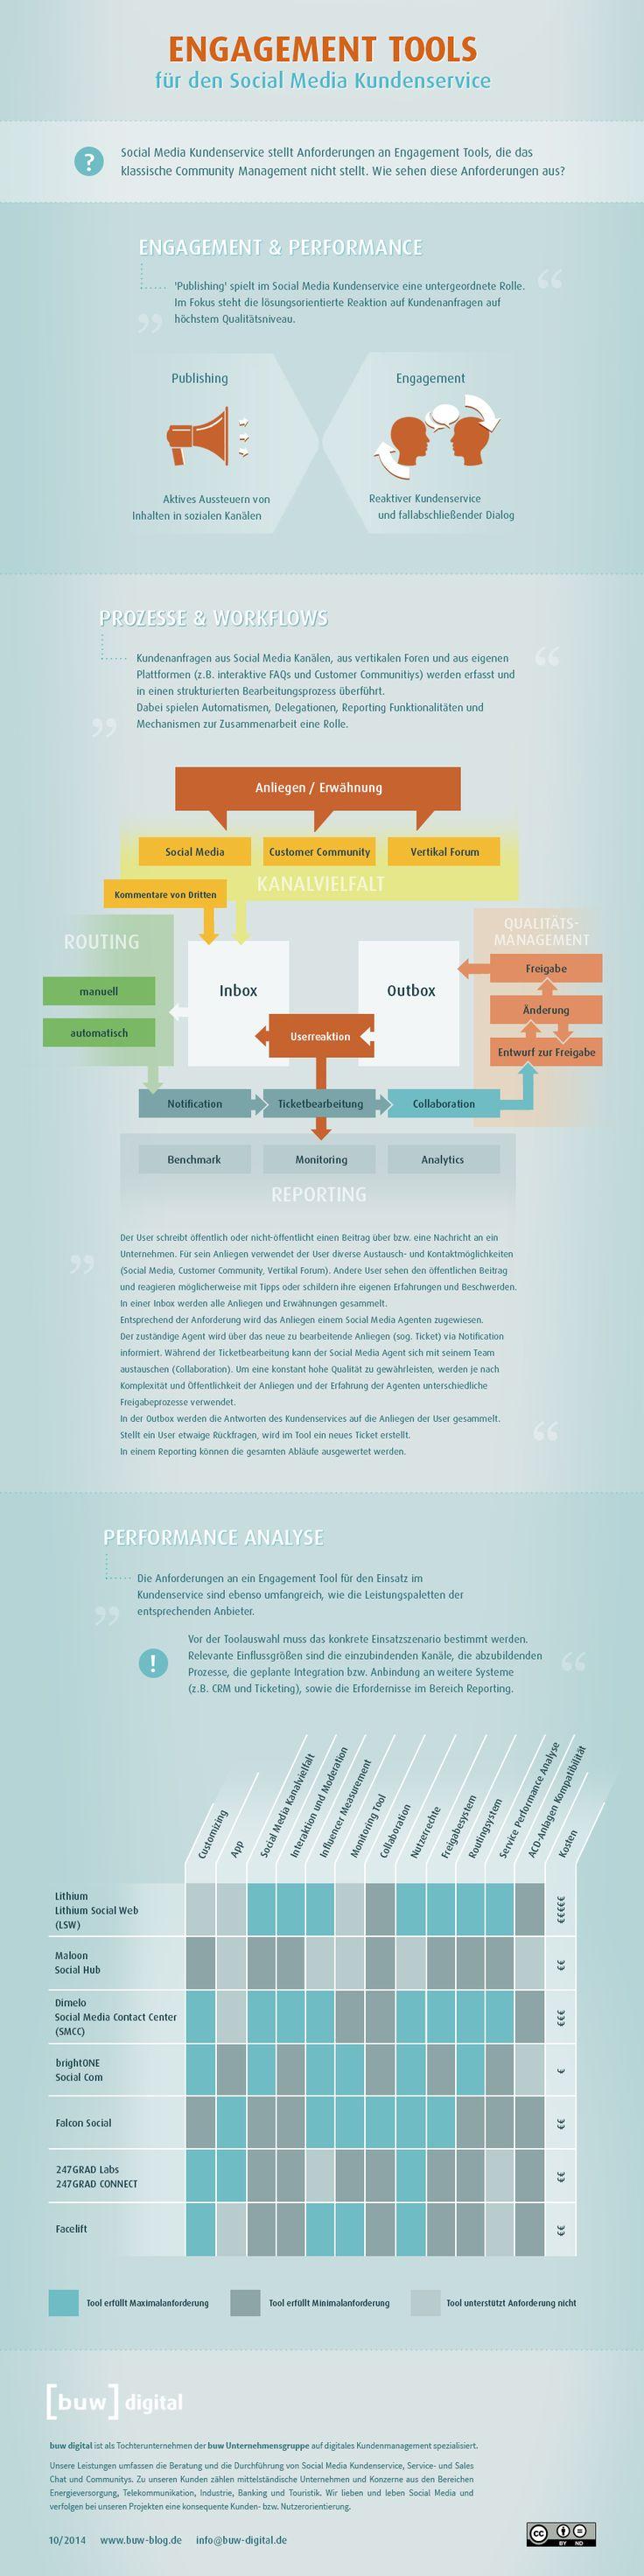 7 Engagement Tools (Übersicht von buw digital) Social Media-Kundenservice (Lithium, Maloon/Social Hub, dimelo, brightONE, Falcon Social, 247GRAD und Facelift)